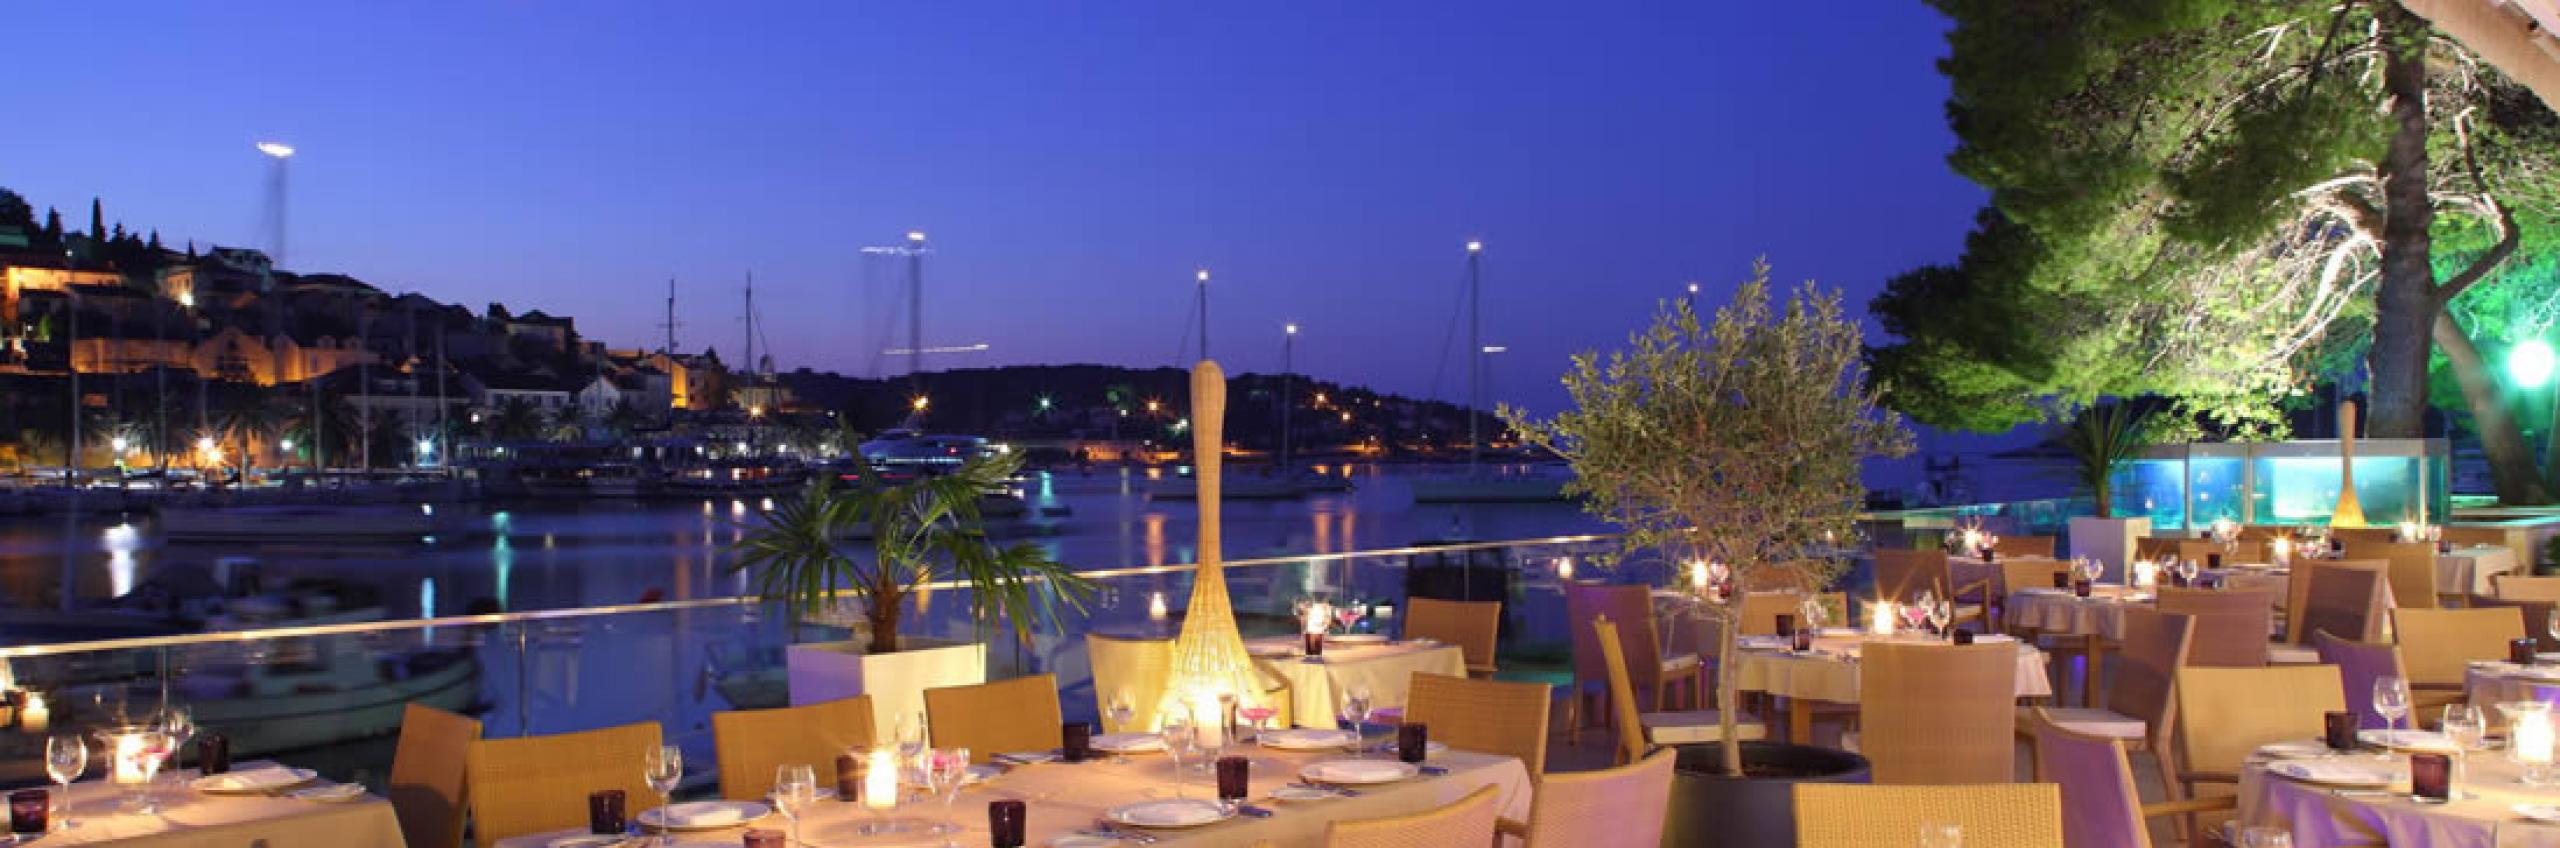 Suncani Hvar Hotels Transfers